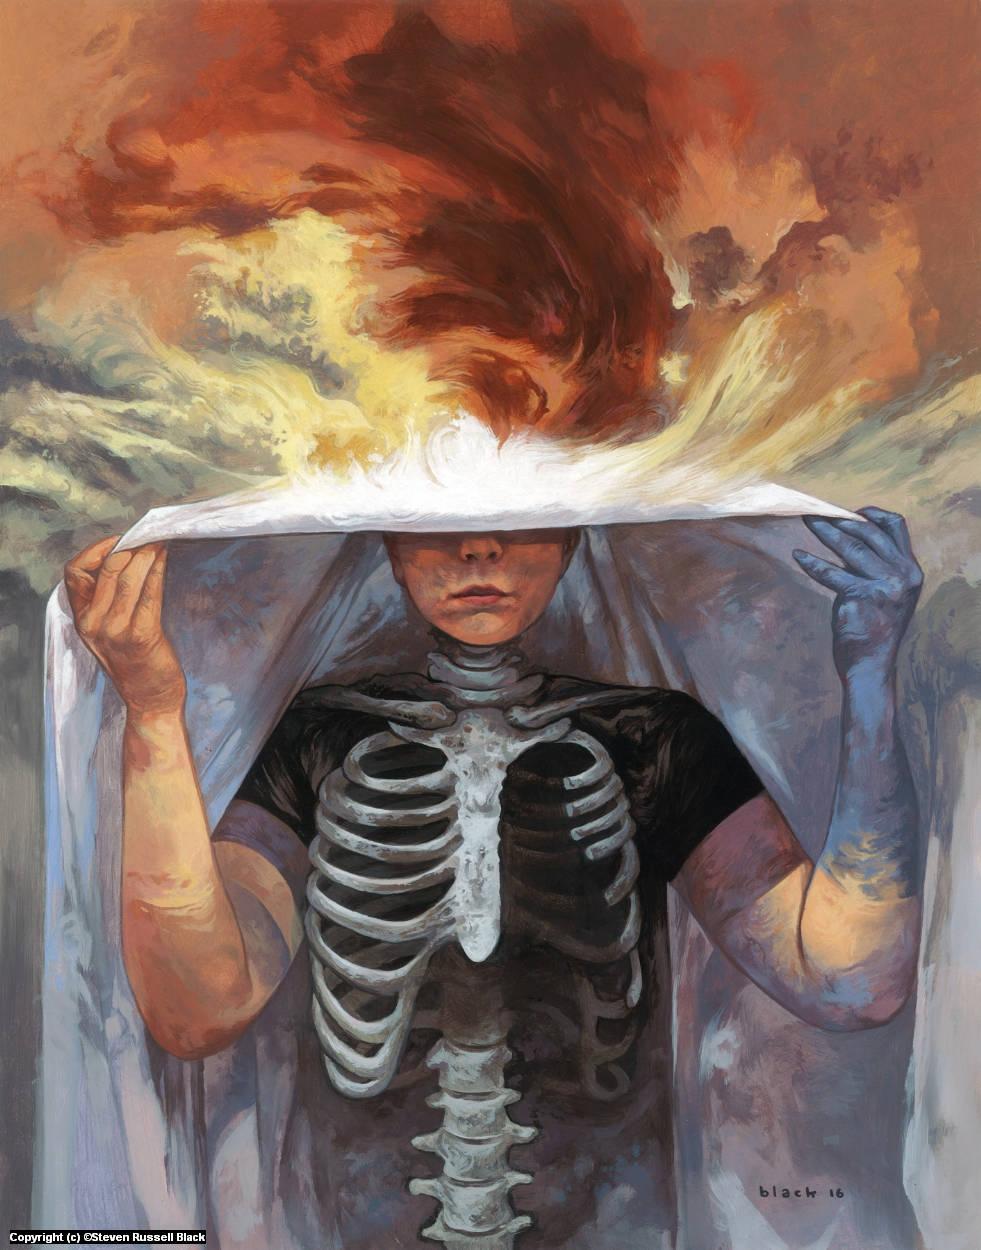 Walker Between Worlds Kingdom of Nothing Artwork by Steven Black